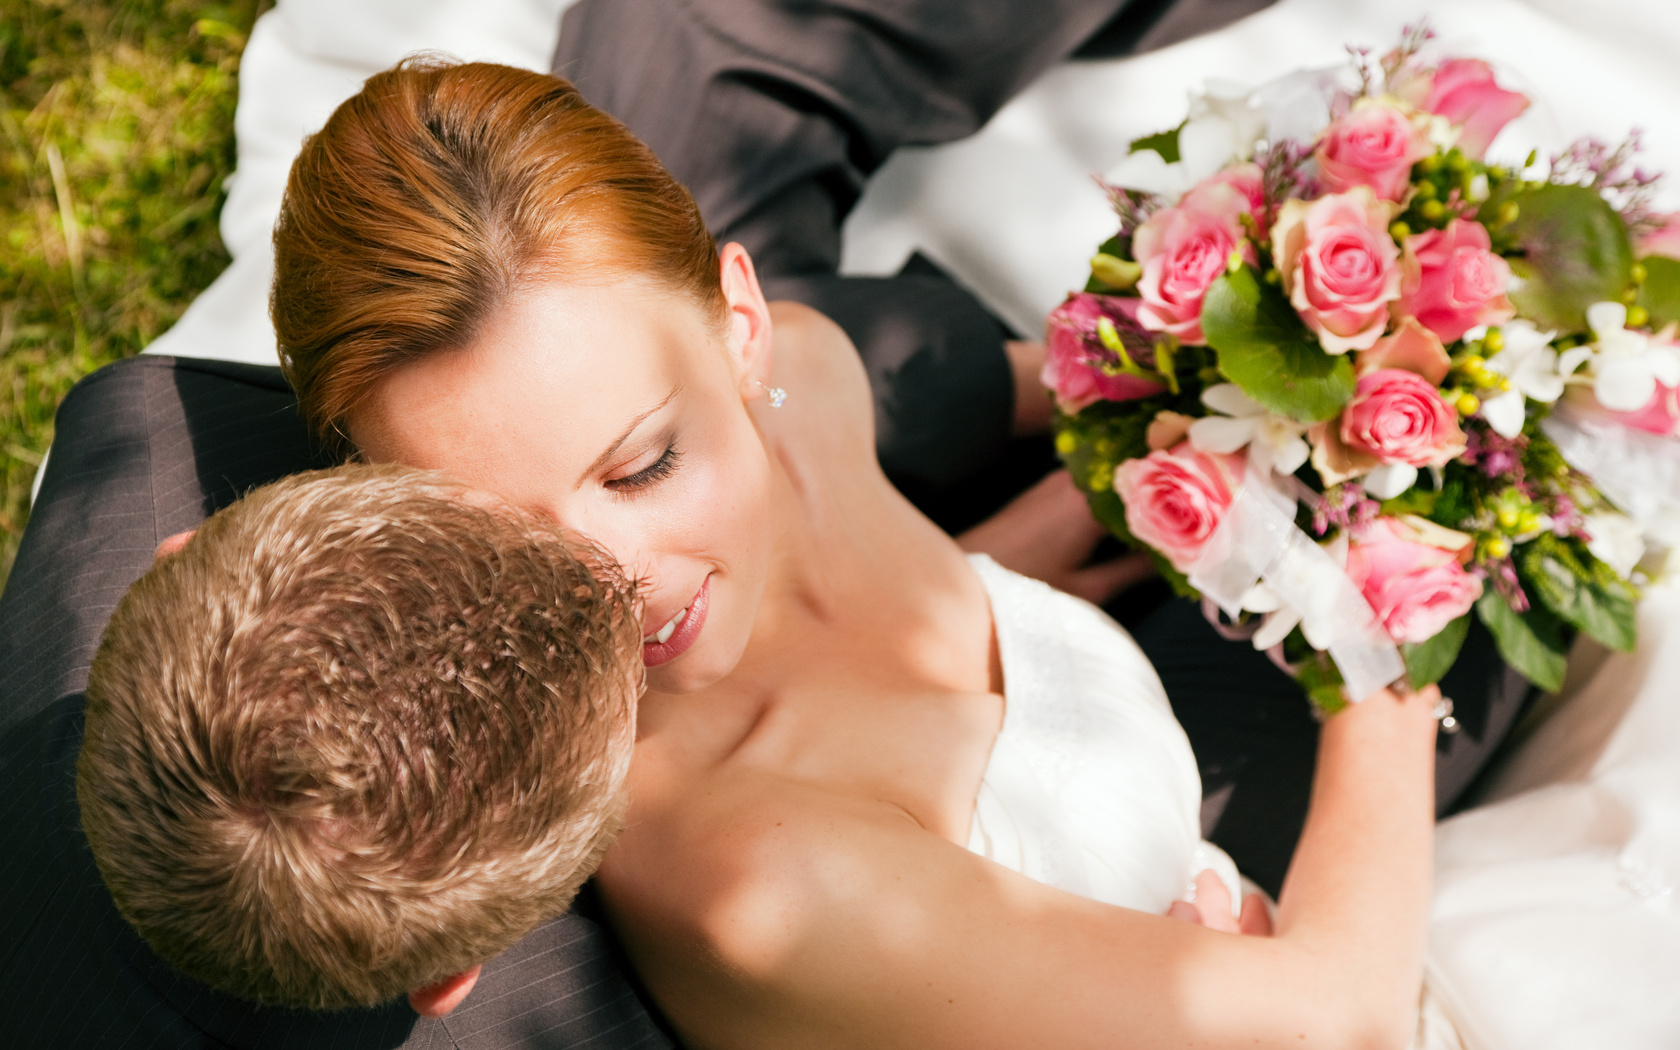 zhenih-darit-neveste-buket-tsvetov Выкуп невесты: подробное описание обычая